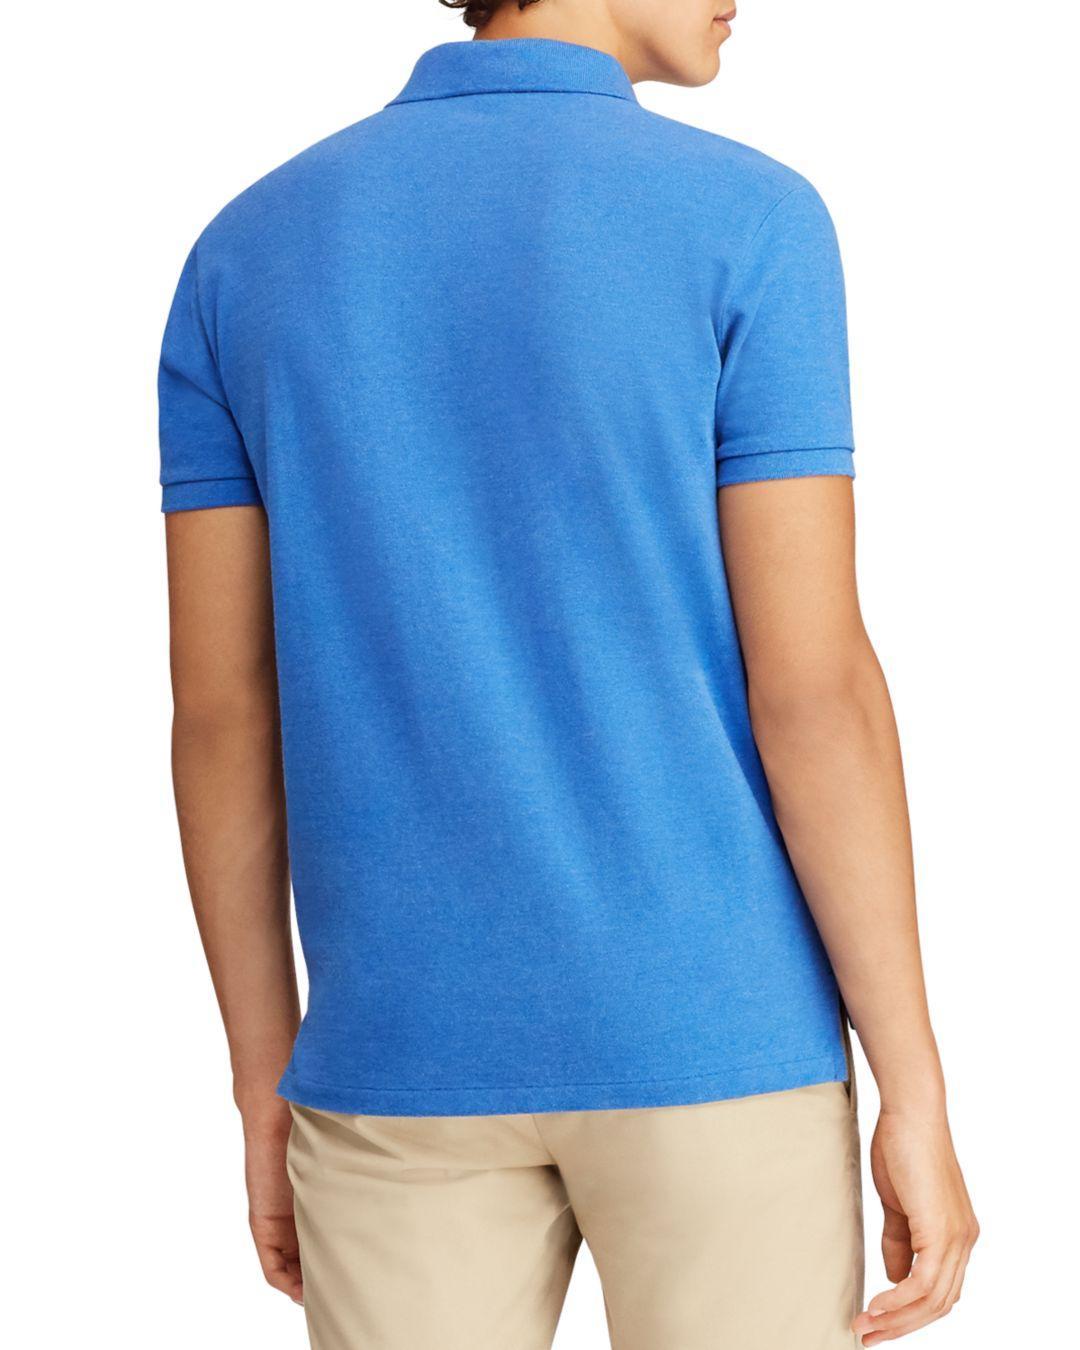 69368154 Lyst - Polo Ralph Lauren Custom Slim Fit Mesh Short Sleeve Polo Shirt in  Blue for Men - Save 31%